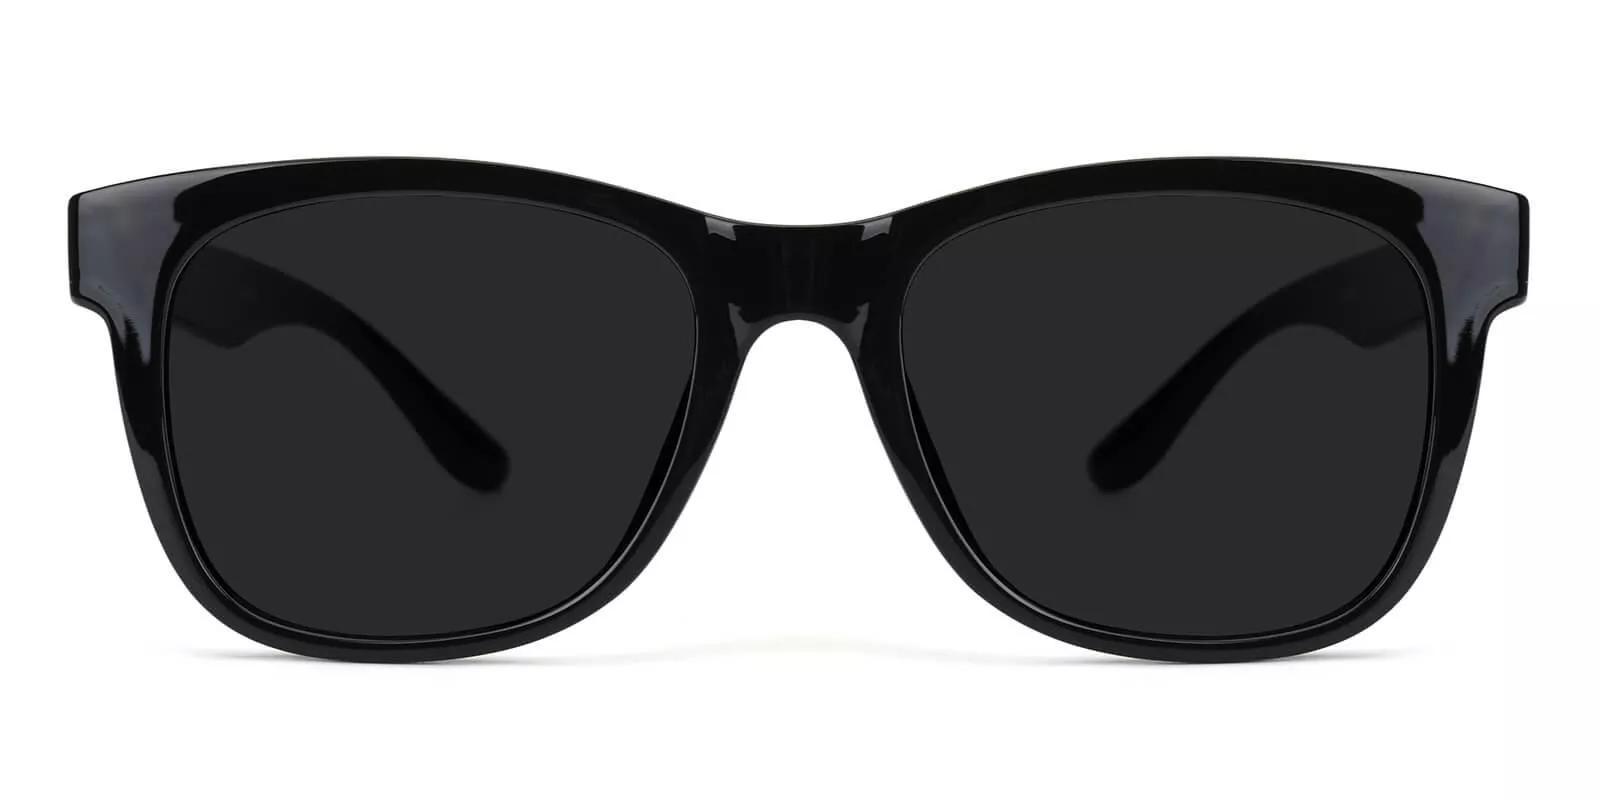 Fairfield Prescription Sunglasses Black